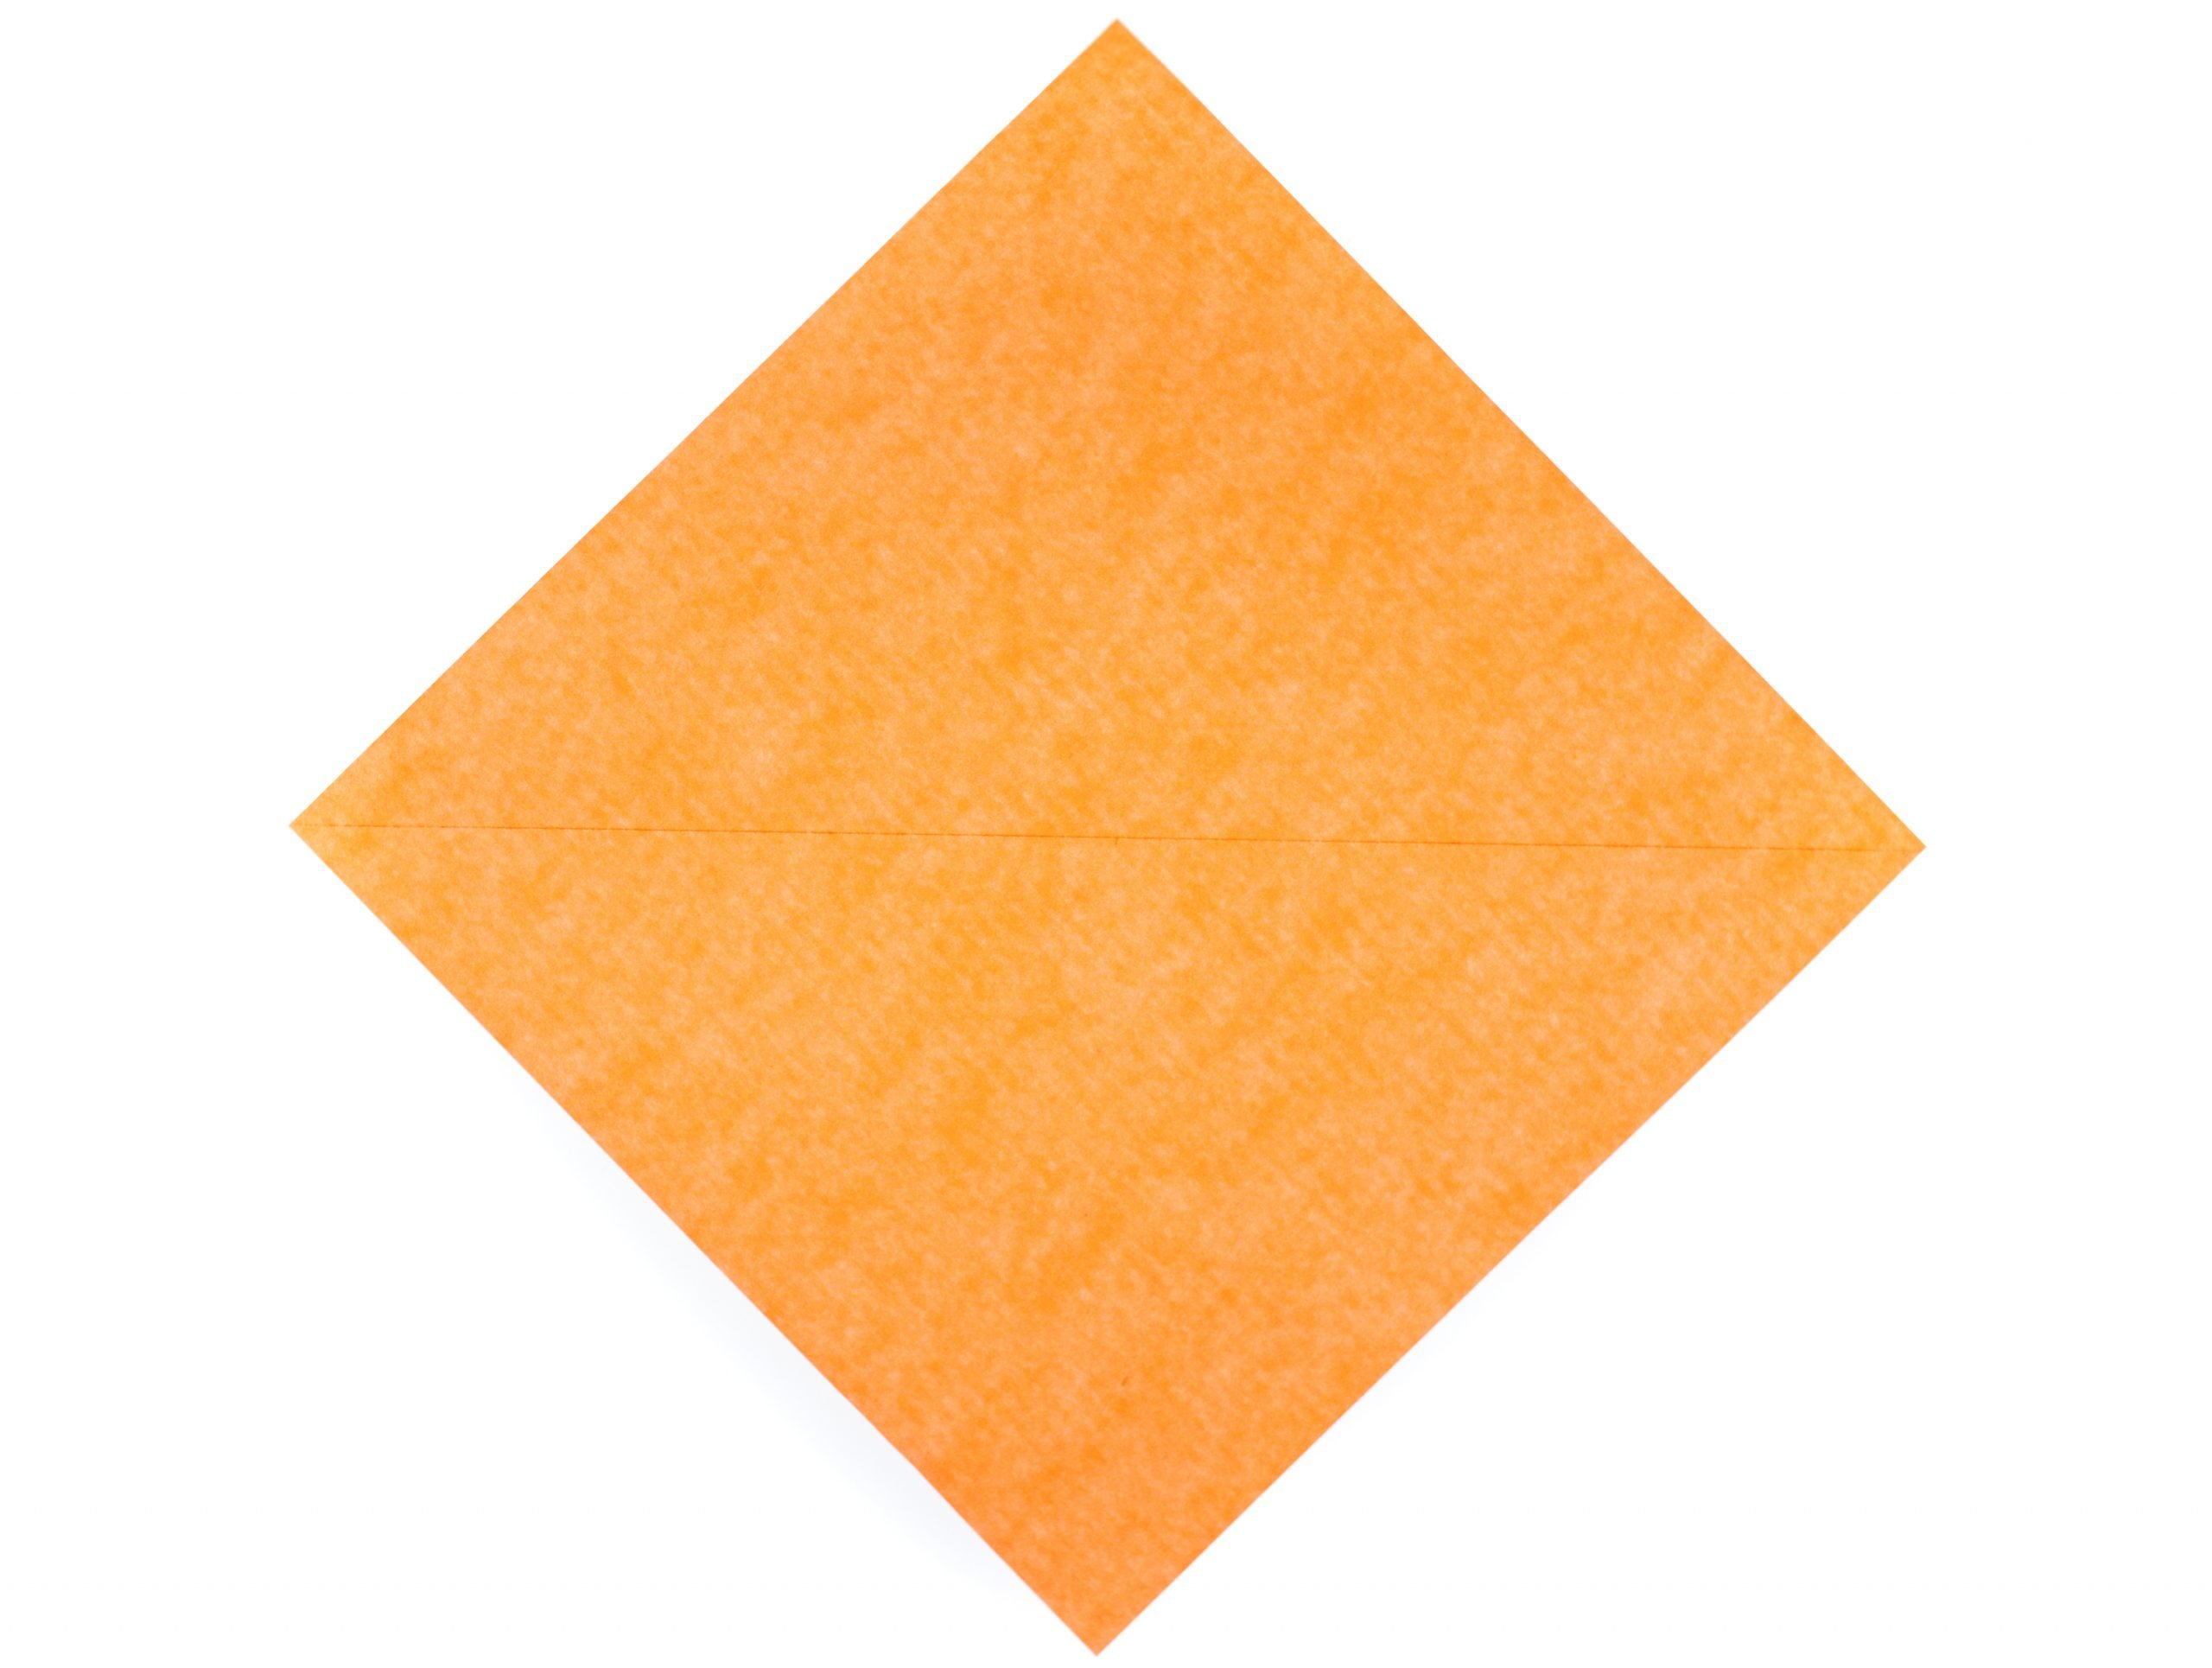 orange kite paper square with diagonal crease